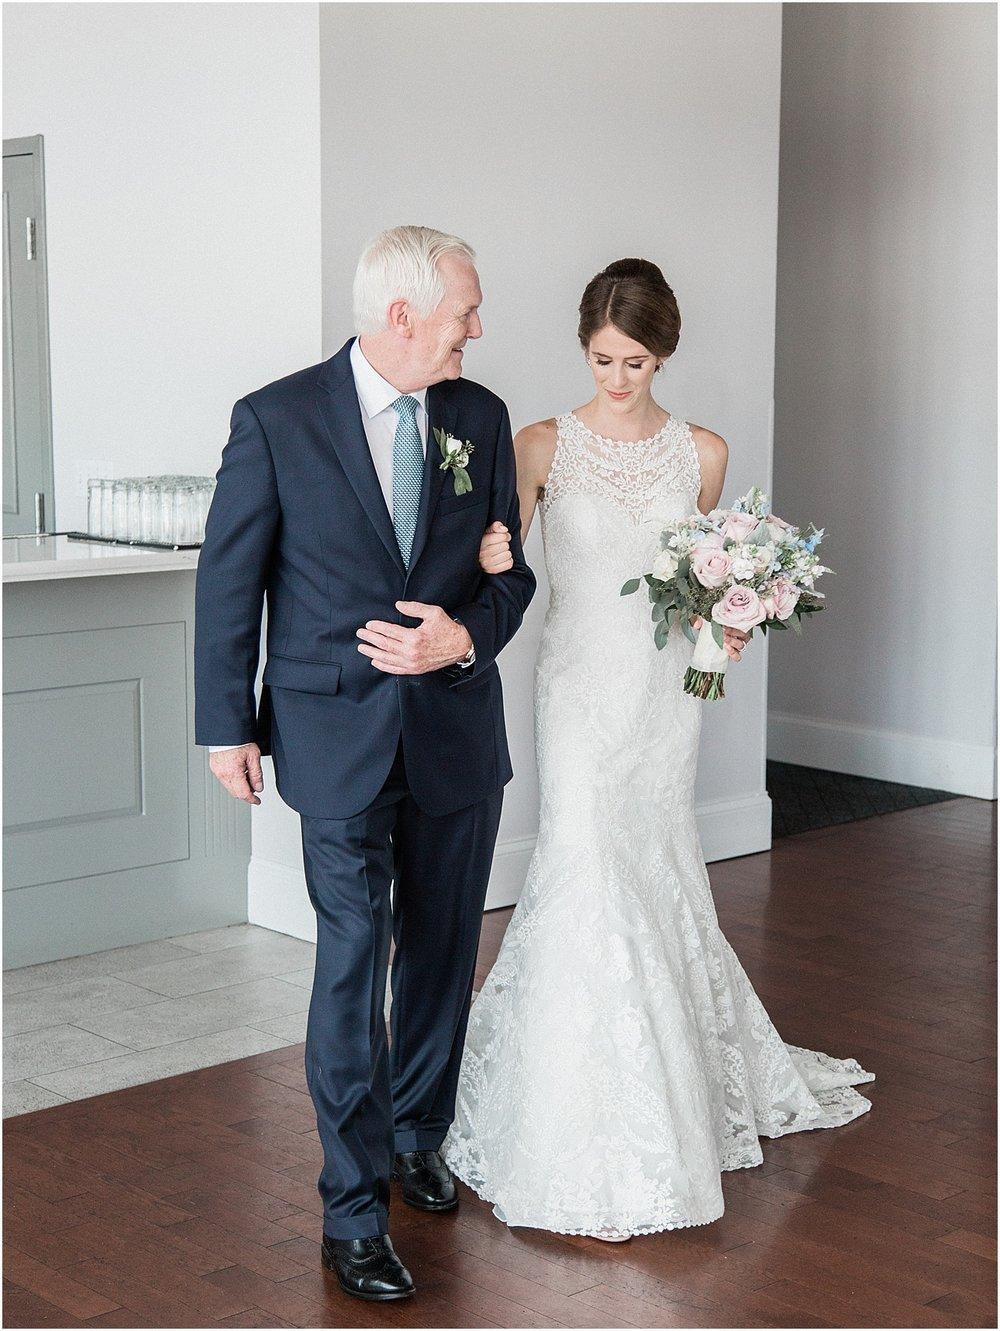 kelly_zach_cruisport_gloucester_ma_bass_rocks_cape_cod_boston_wedding_photographer_meredith_jane_photography_photo_0684.jpg